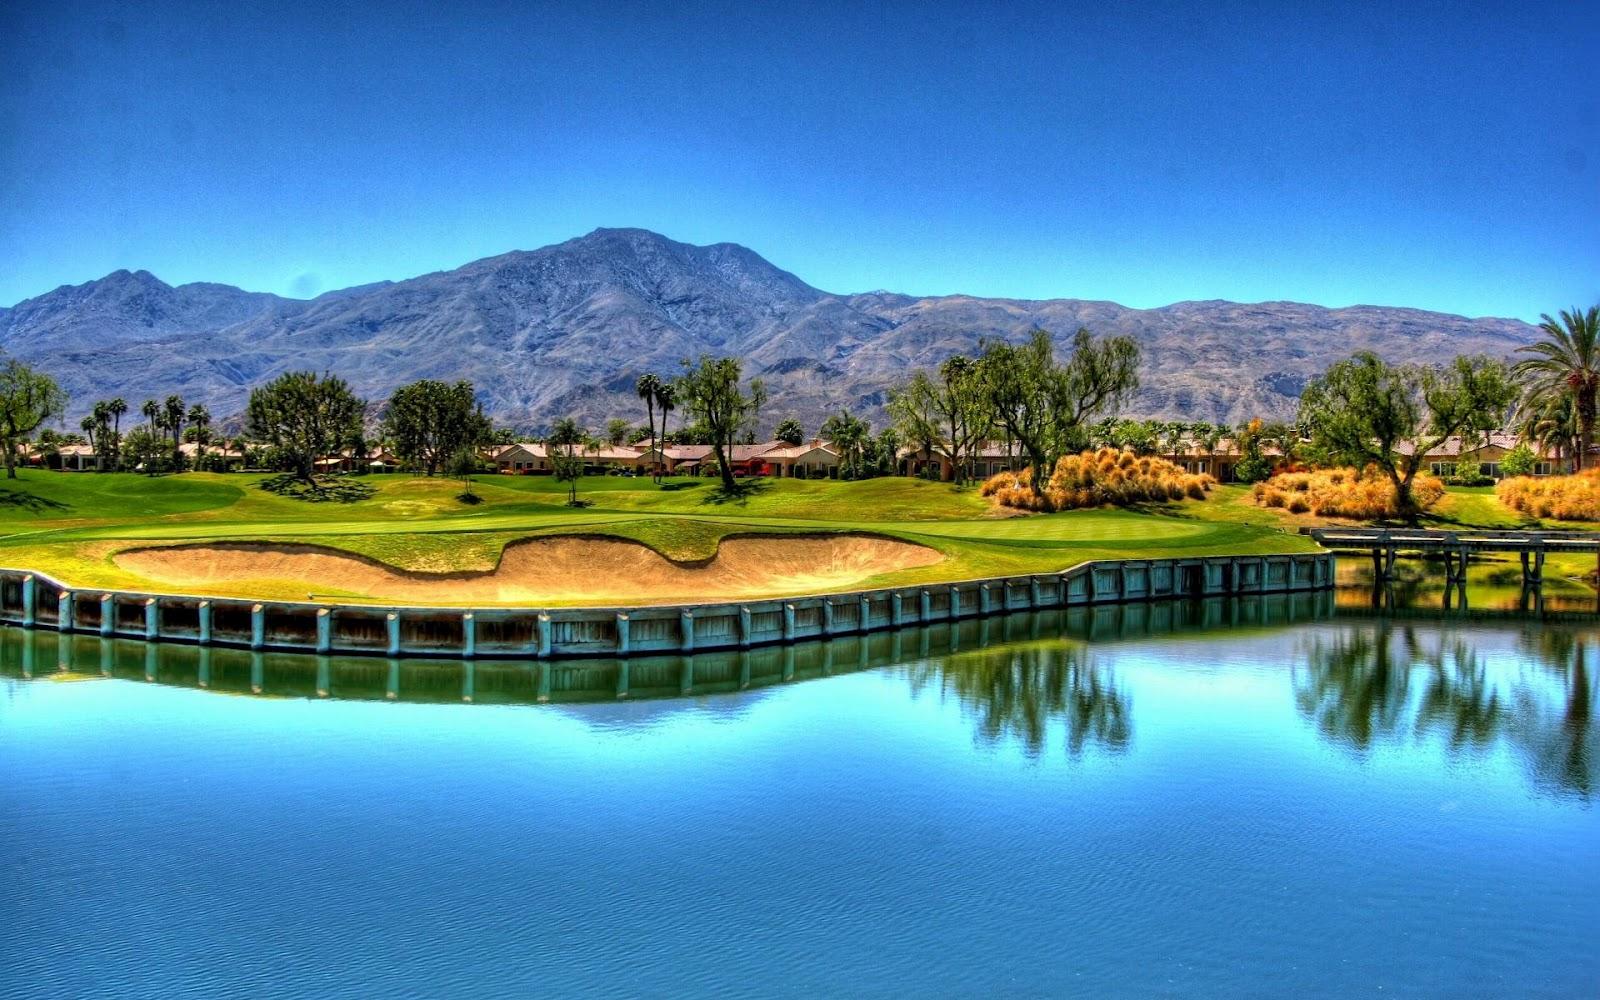 http://2.bp.blogspot.com/-BYUqiQPMMyw/UCYuQUsAuUI/AAAAAAAAMJk/bGyN7hOSxGI/s1600/colorful-golf-course.jpg